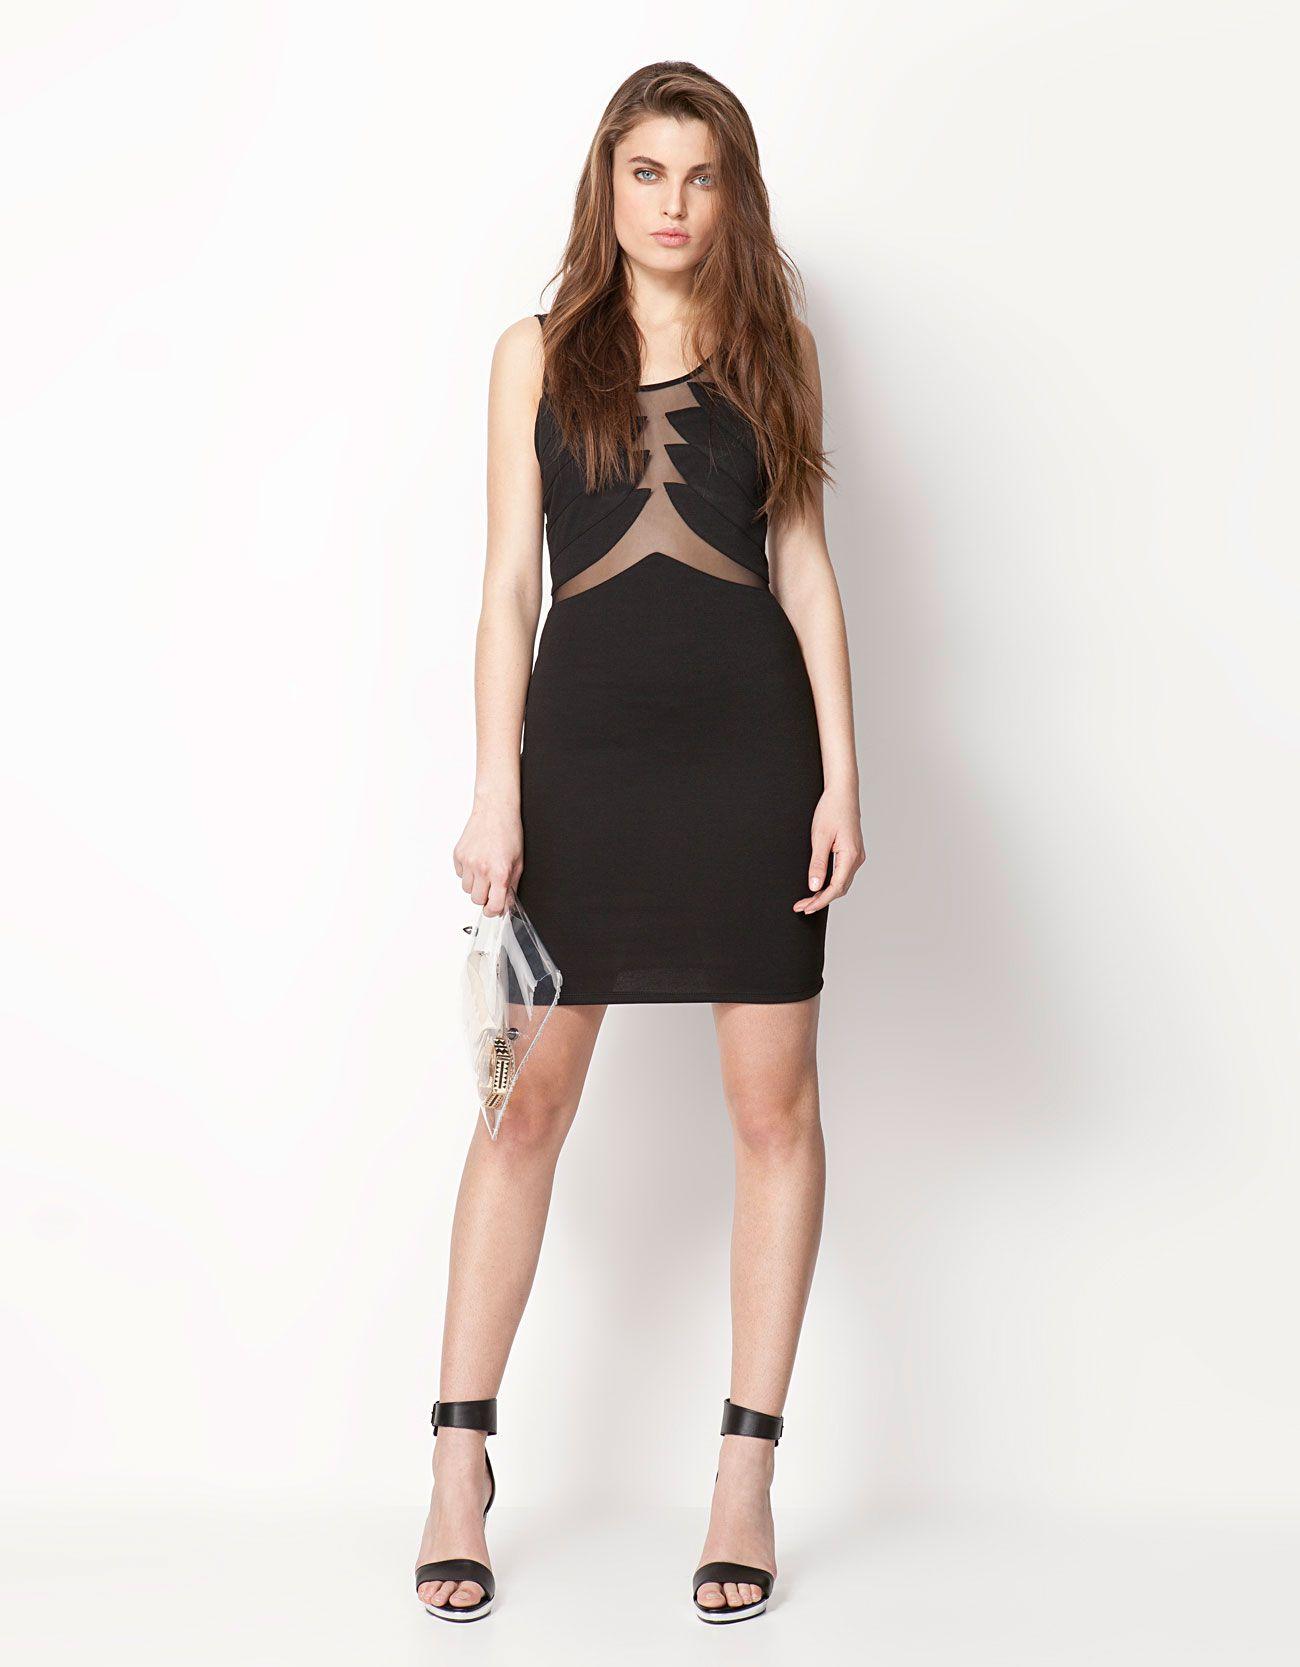 89eea6e63ce9 Bershka dress